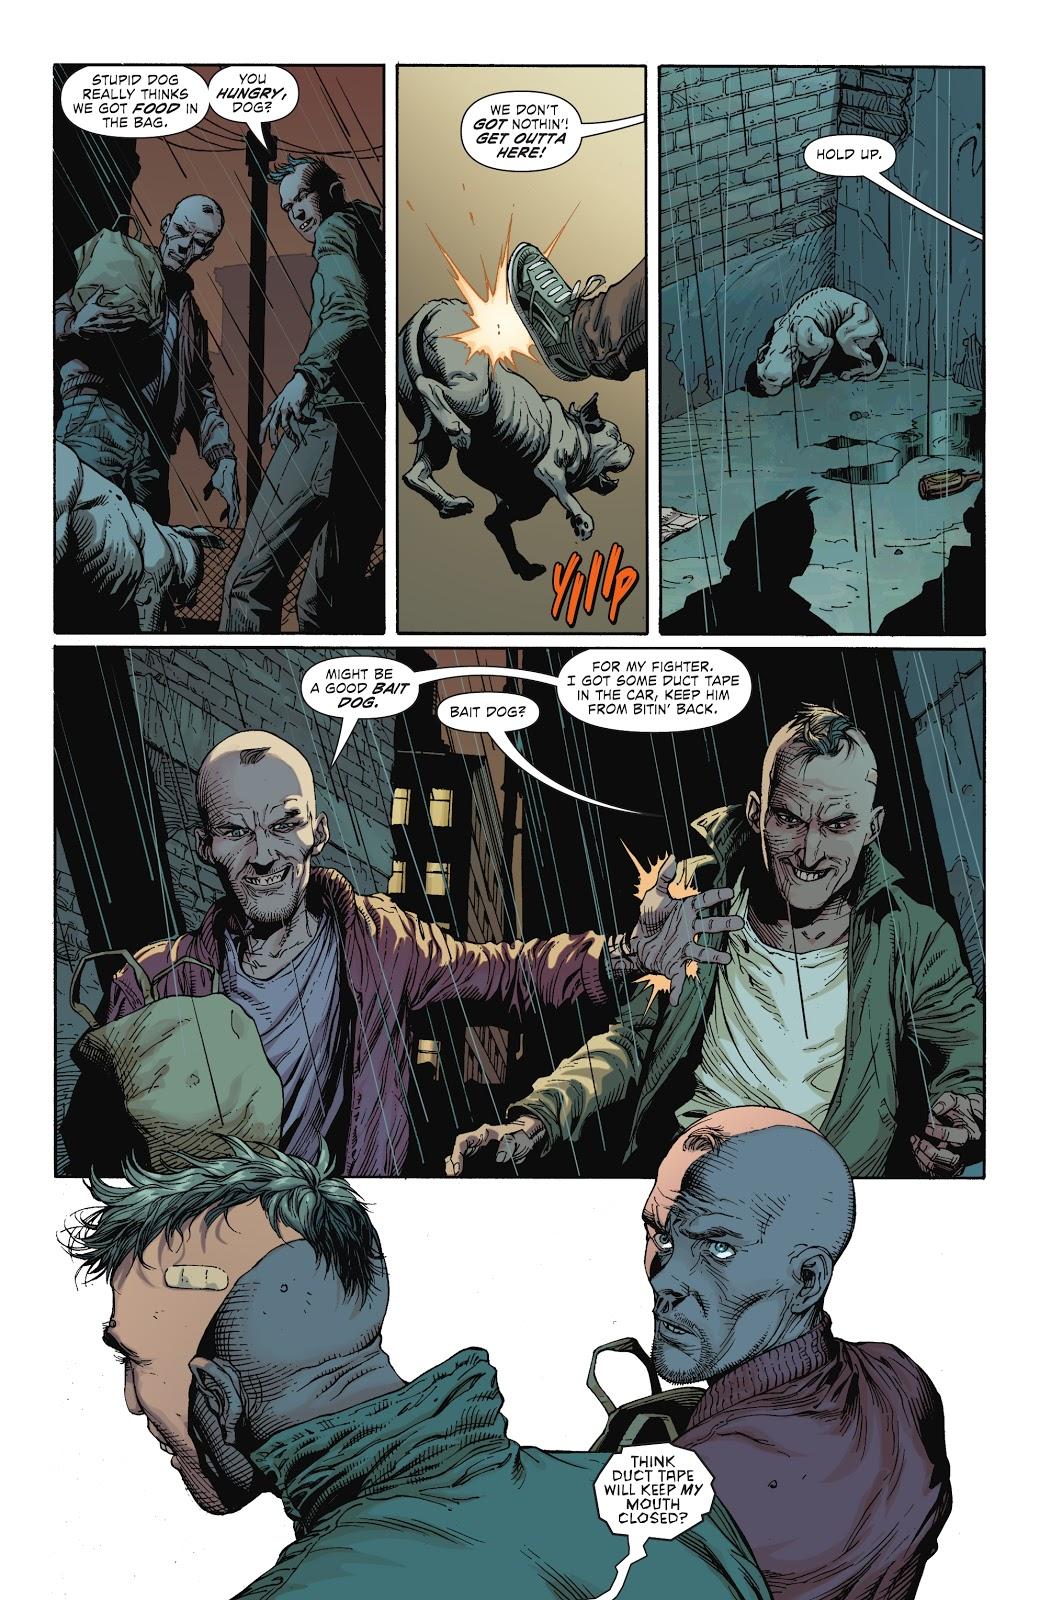 Killer Kroc Saves Bat-Dog (Earth 1)